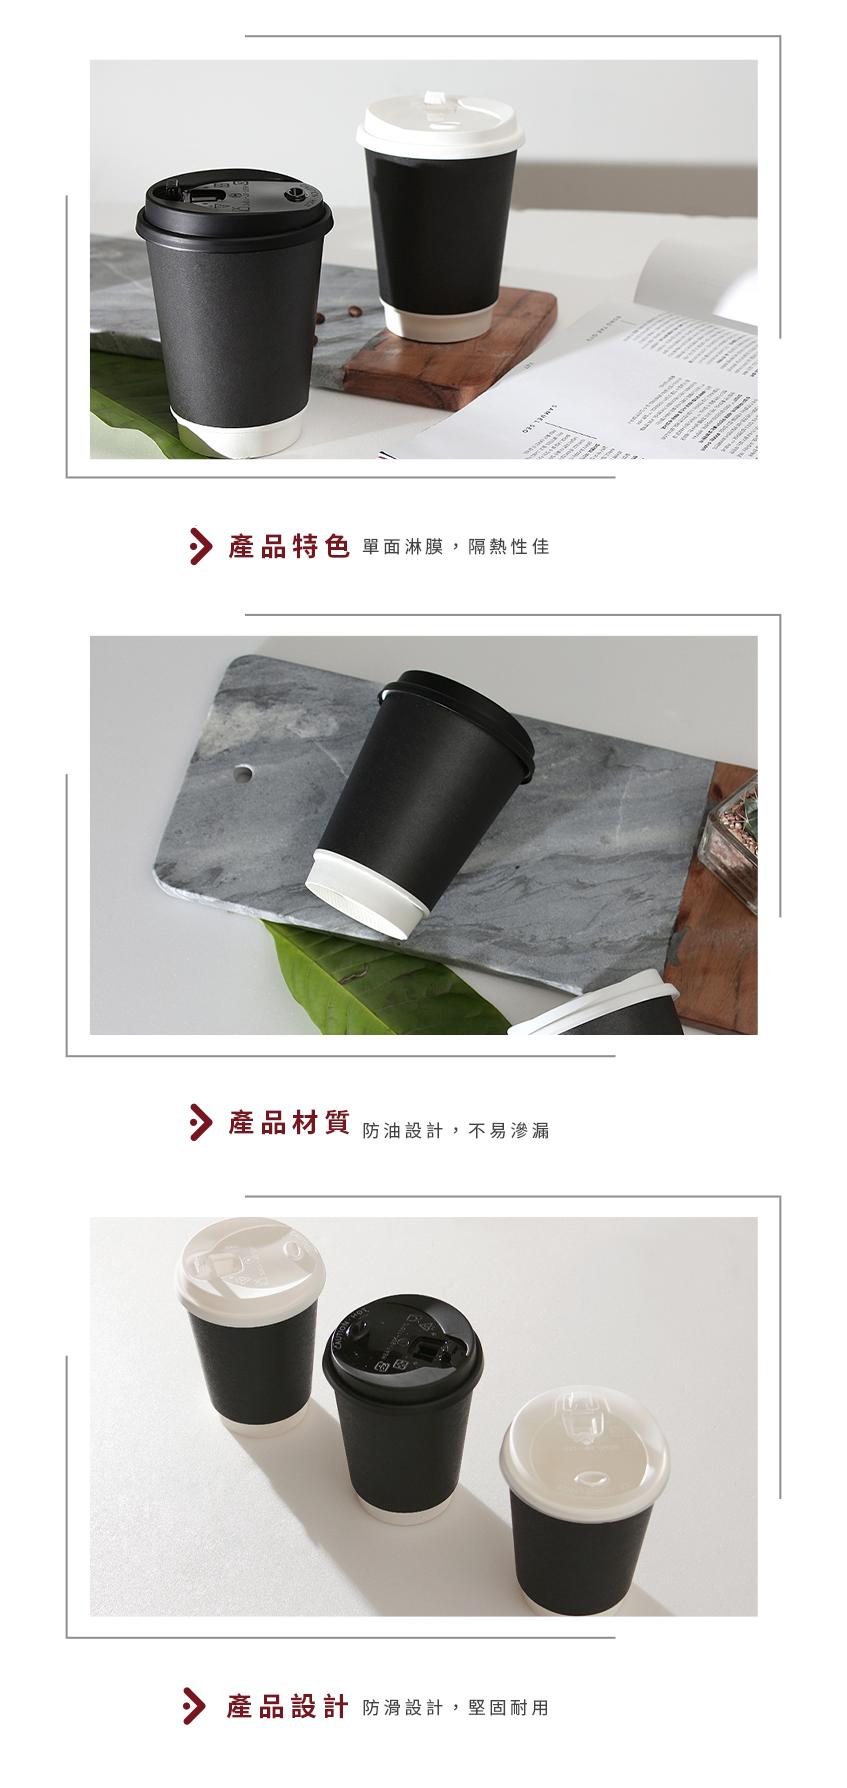 12oz 360ml 黑杯 90口徑 質感 108mm 熱杯 隔熱紙杯 熱飲杯 加厚紙杯 耐熱杯 防燙杯 雙層杯 隔熱 一次性紙杯 雙層熱飲紙杯 咖啡杯 PE單面淋膜